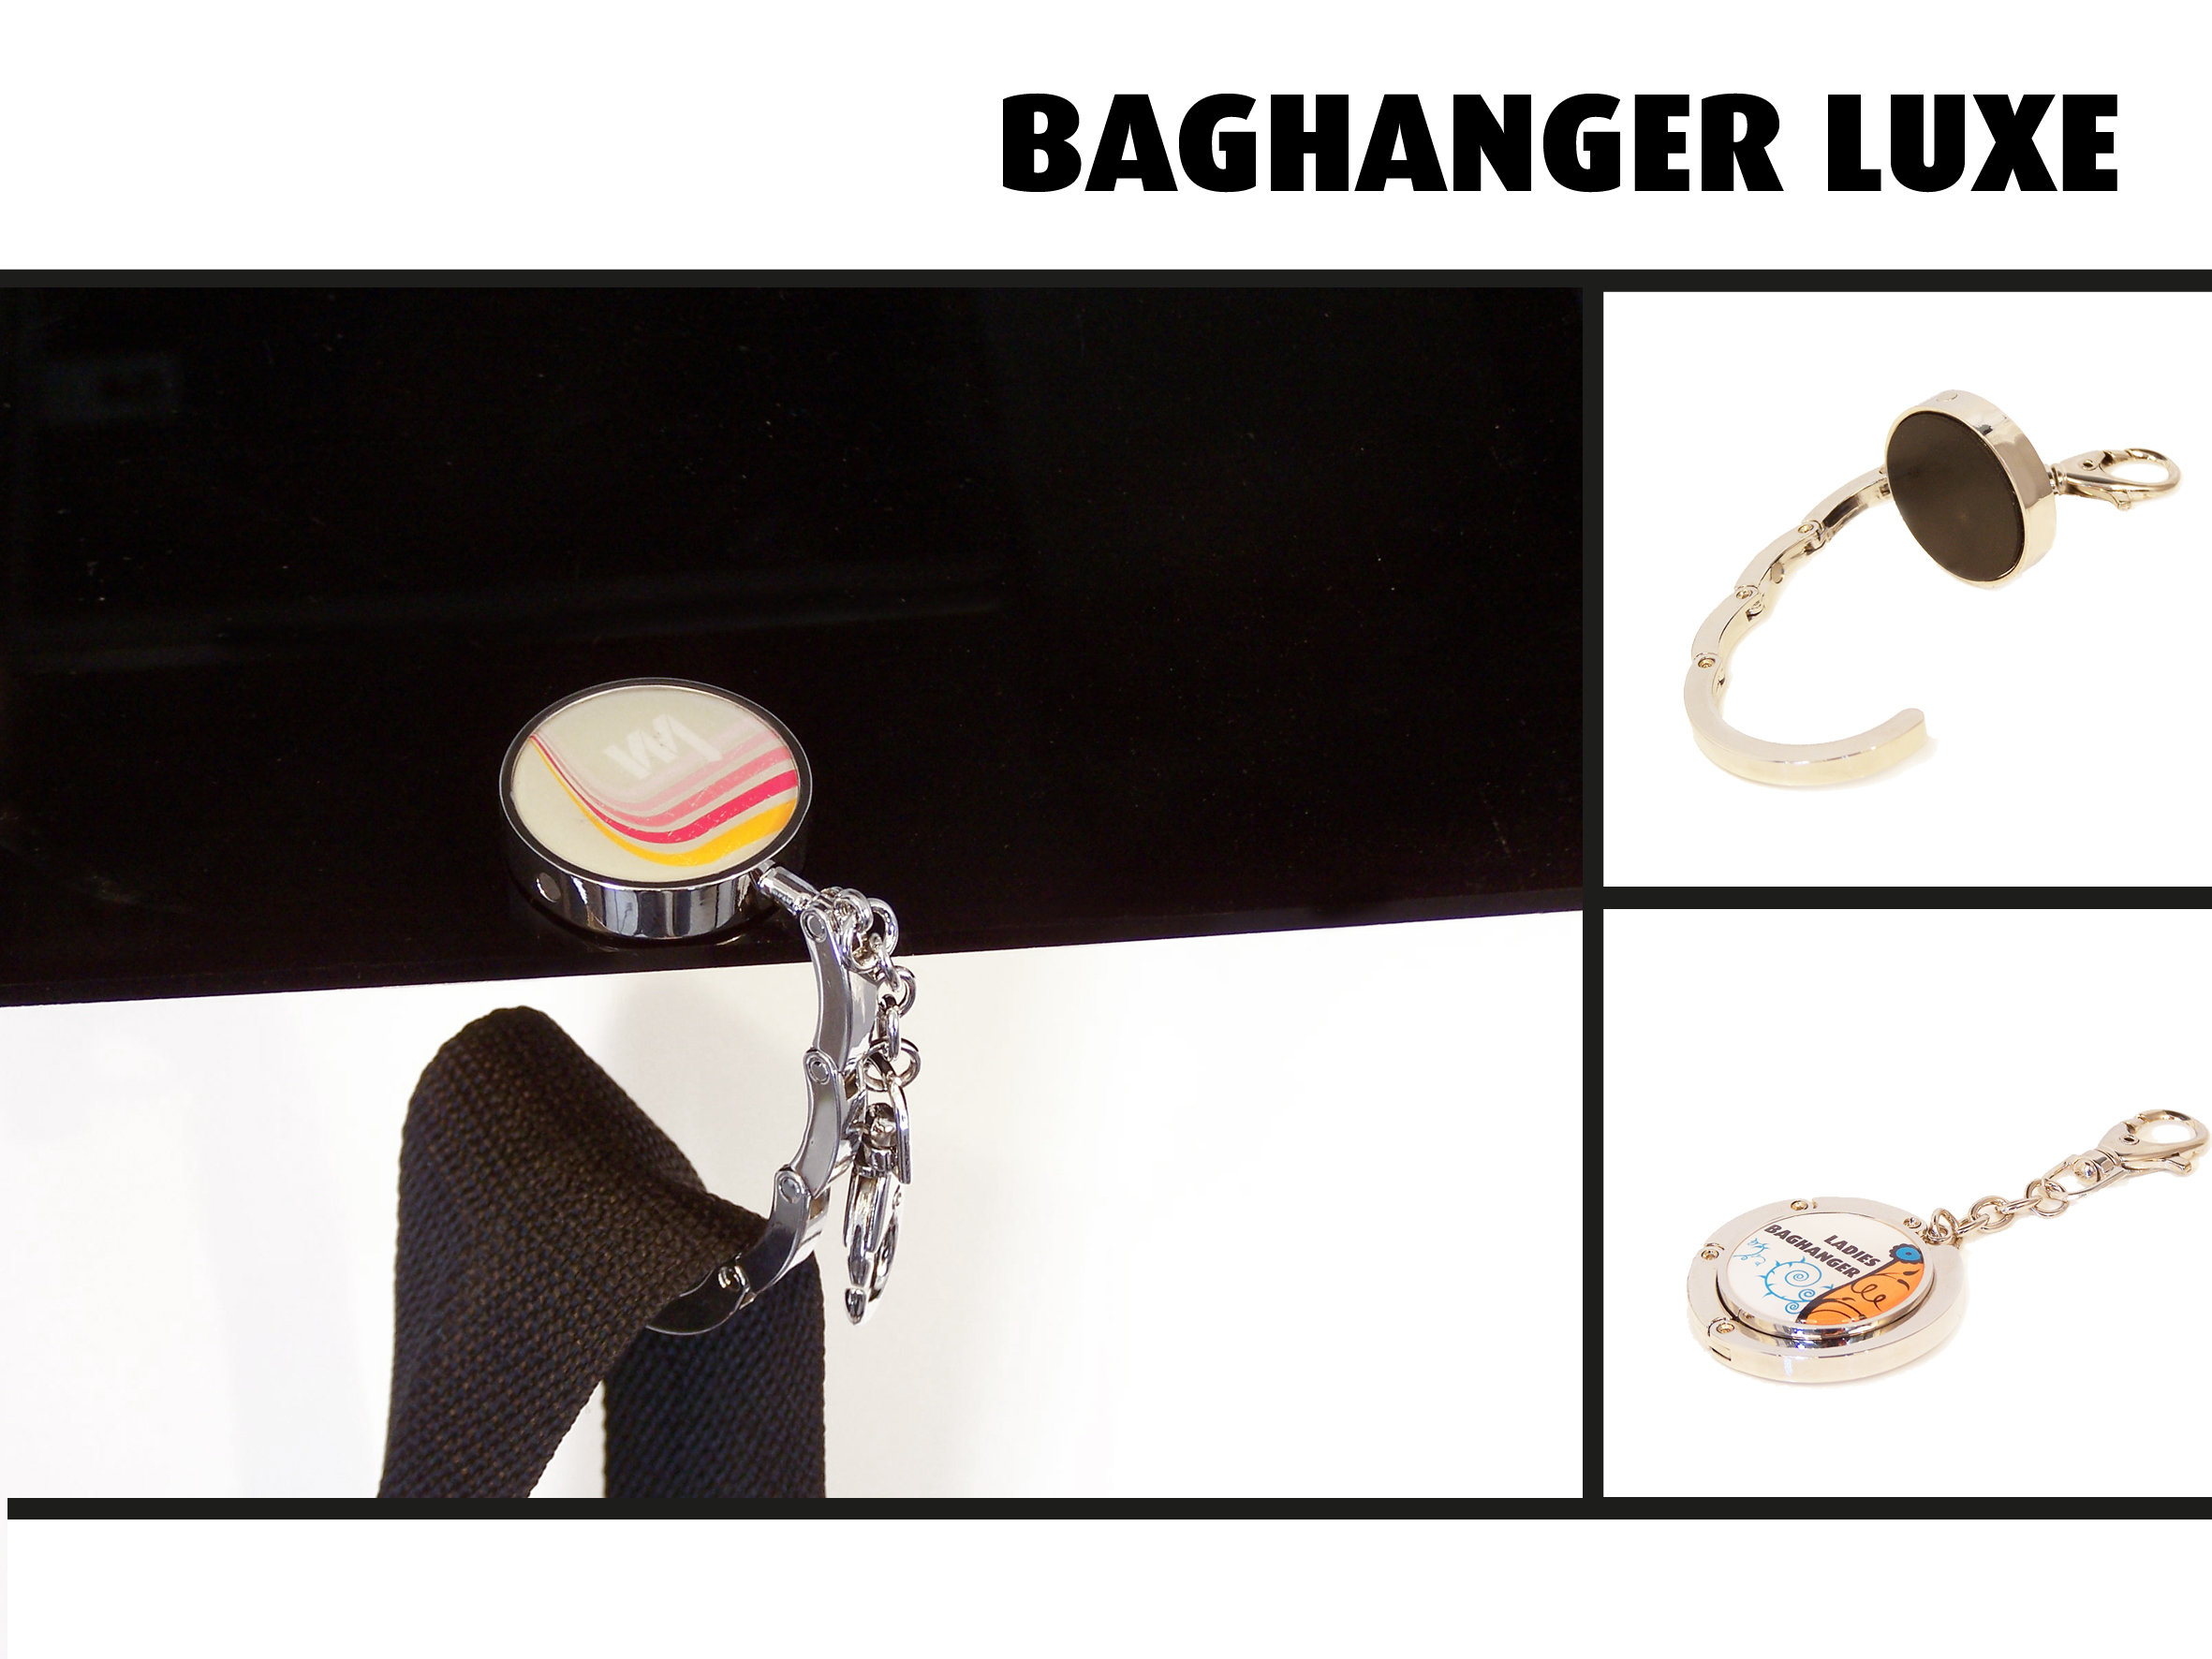 BAGHANGER (luxe)